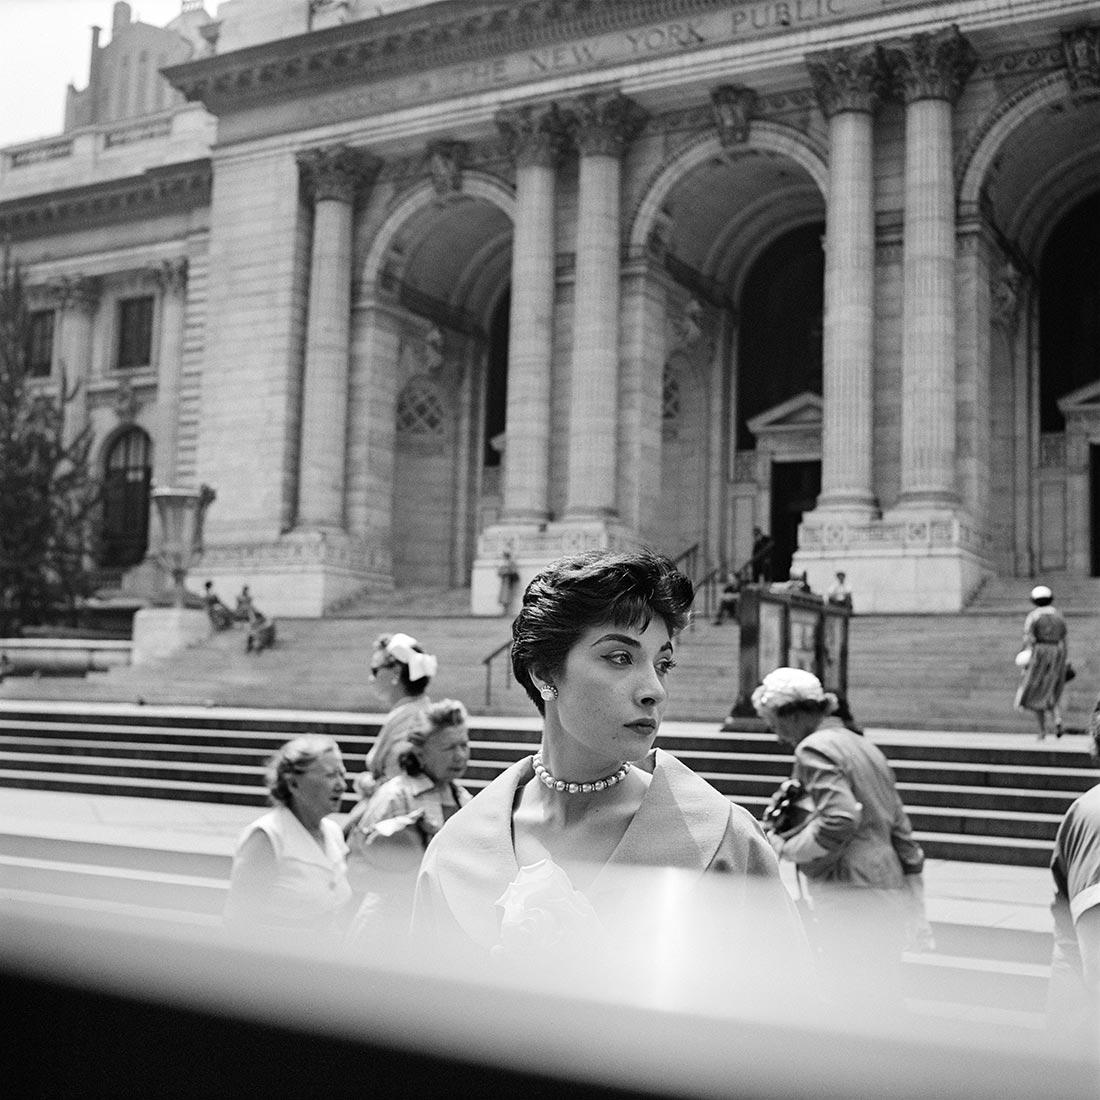 Vivian Maier - Photo of woman shot through a bus window